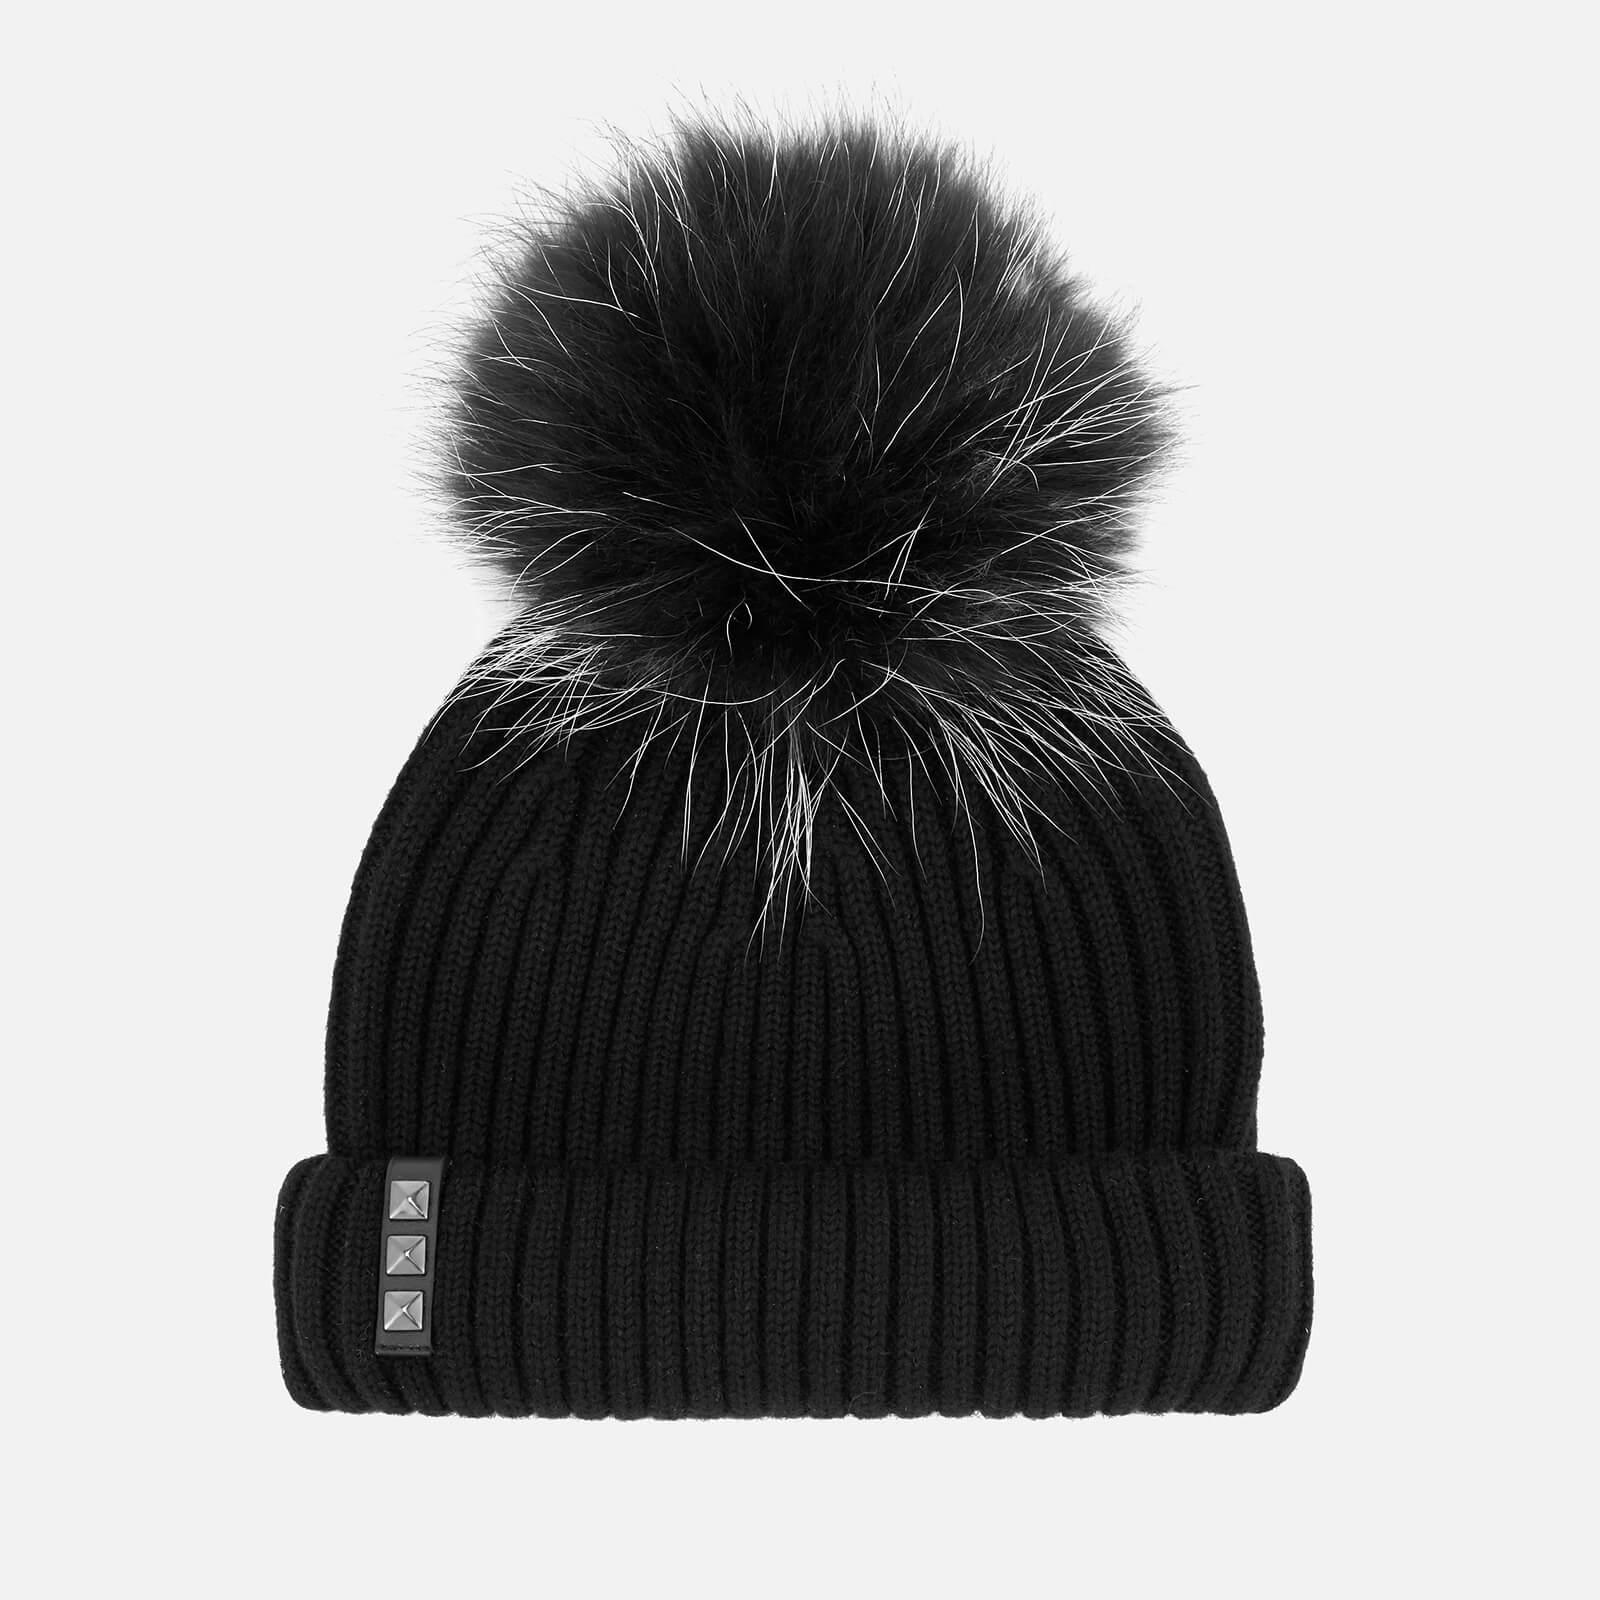 6bd0da8e6 BKLYN Women's Merino Wool Hat with Black/White Pom Pom - Black